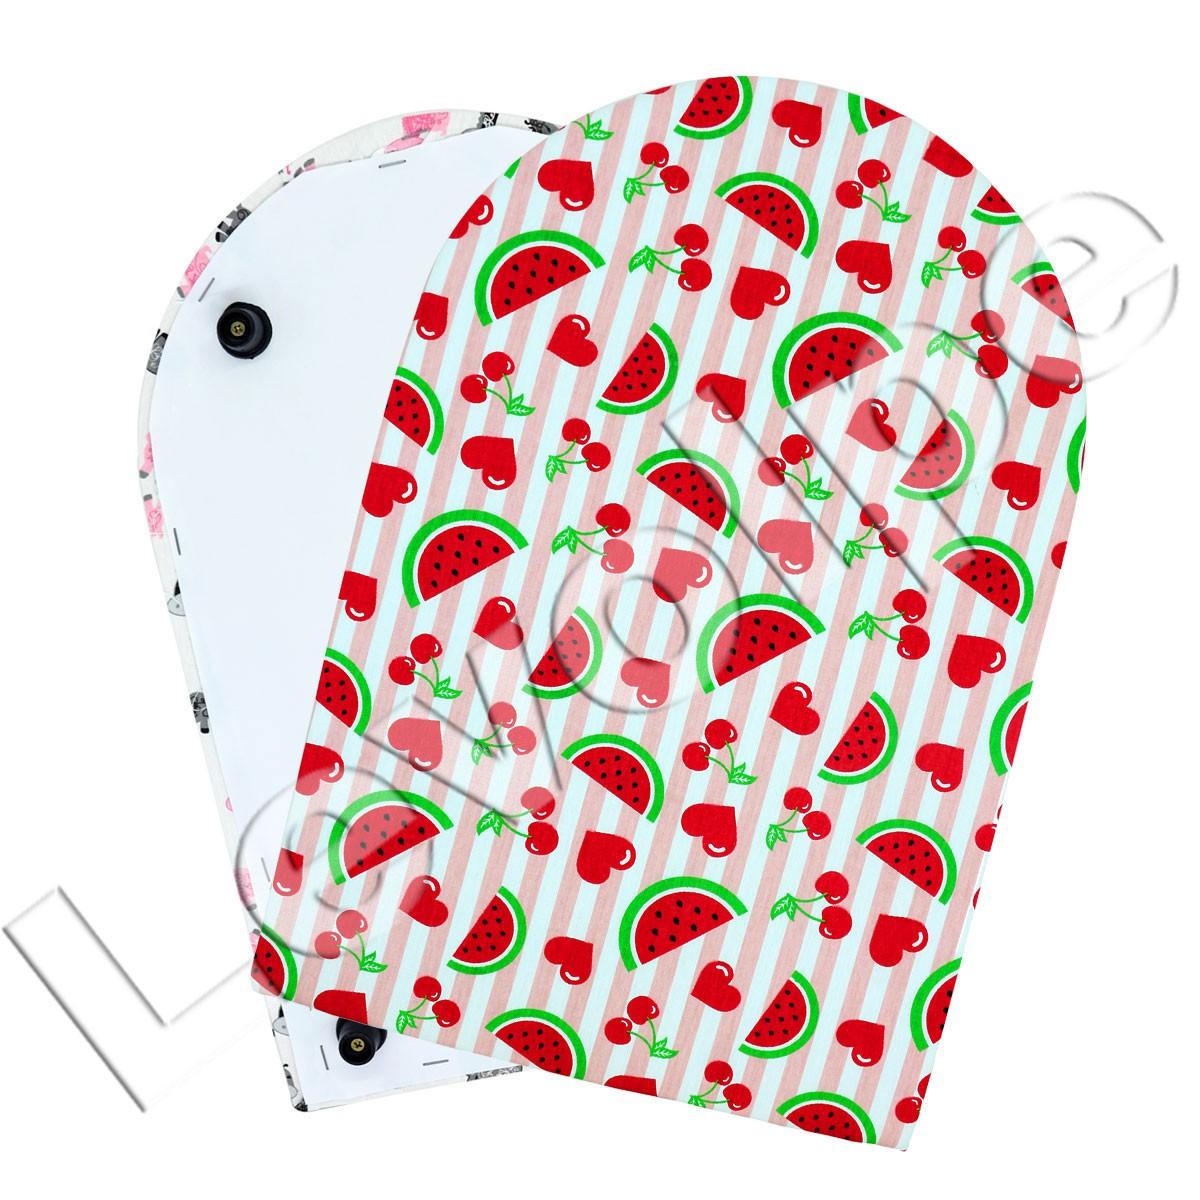 Mini Tábua Portátil De Passar Roupa Scrapbook Patchwork - (Estampa Aleatória)